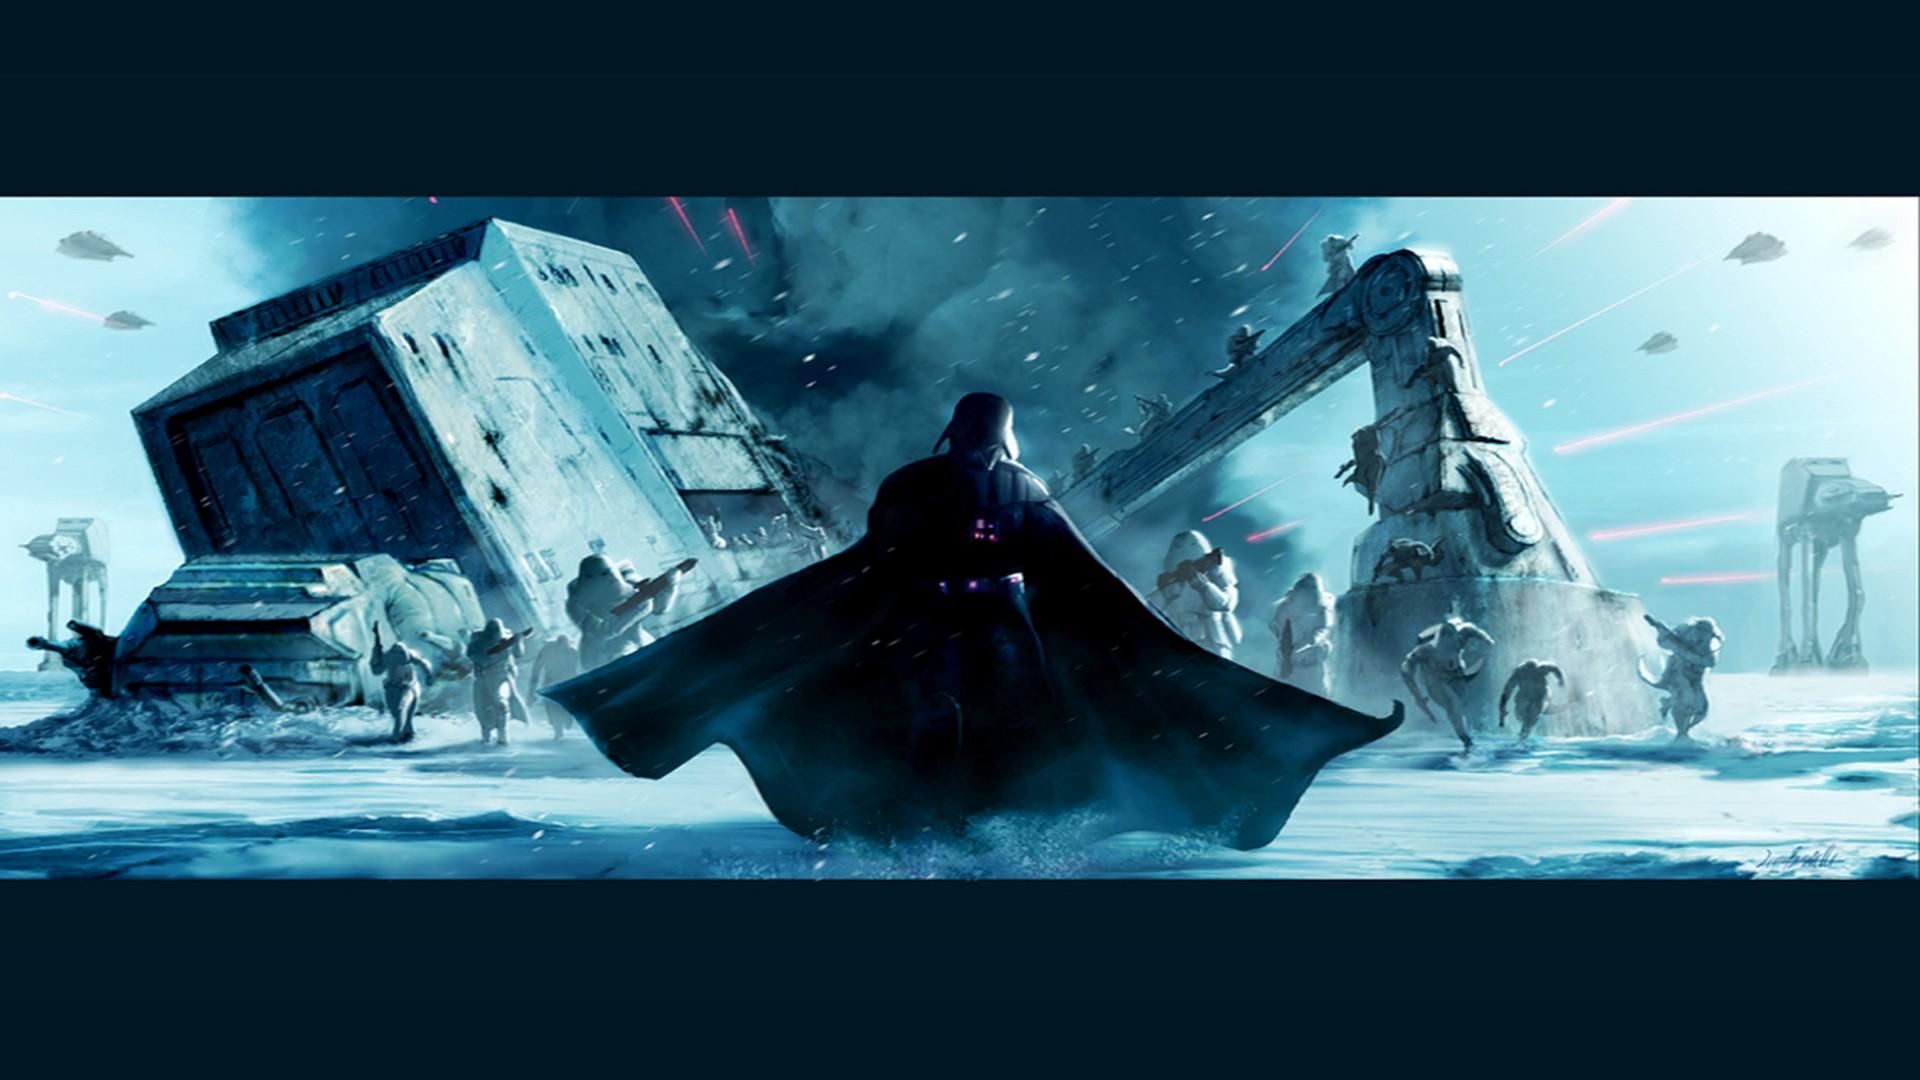 72 Star Wars Desktop Backgrounds Download Free Stunning